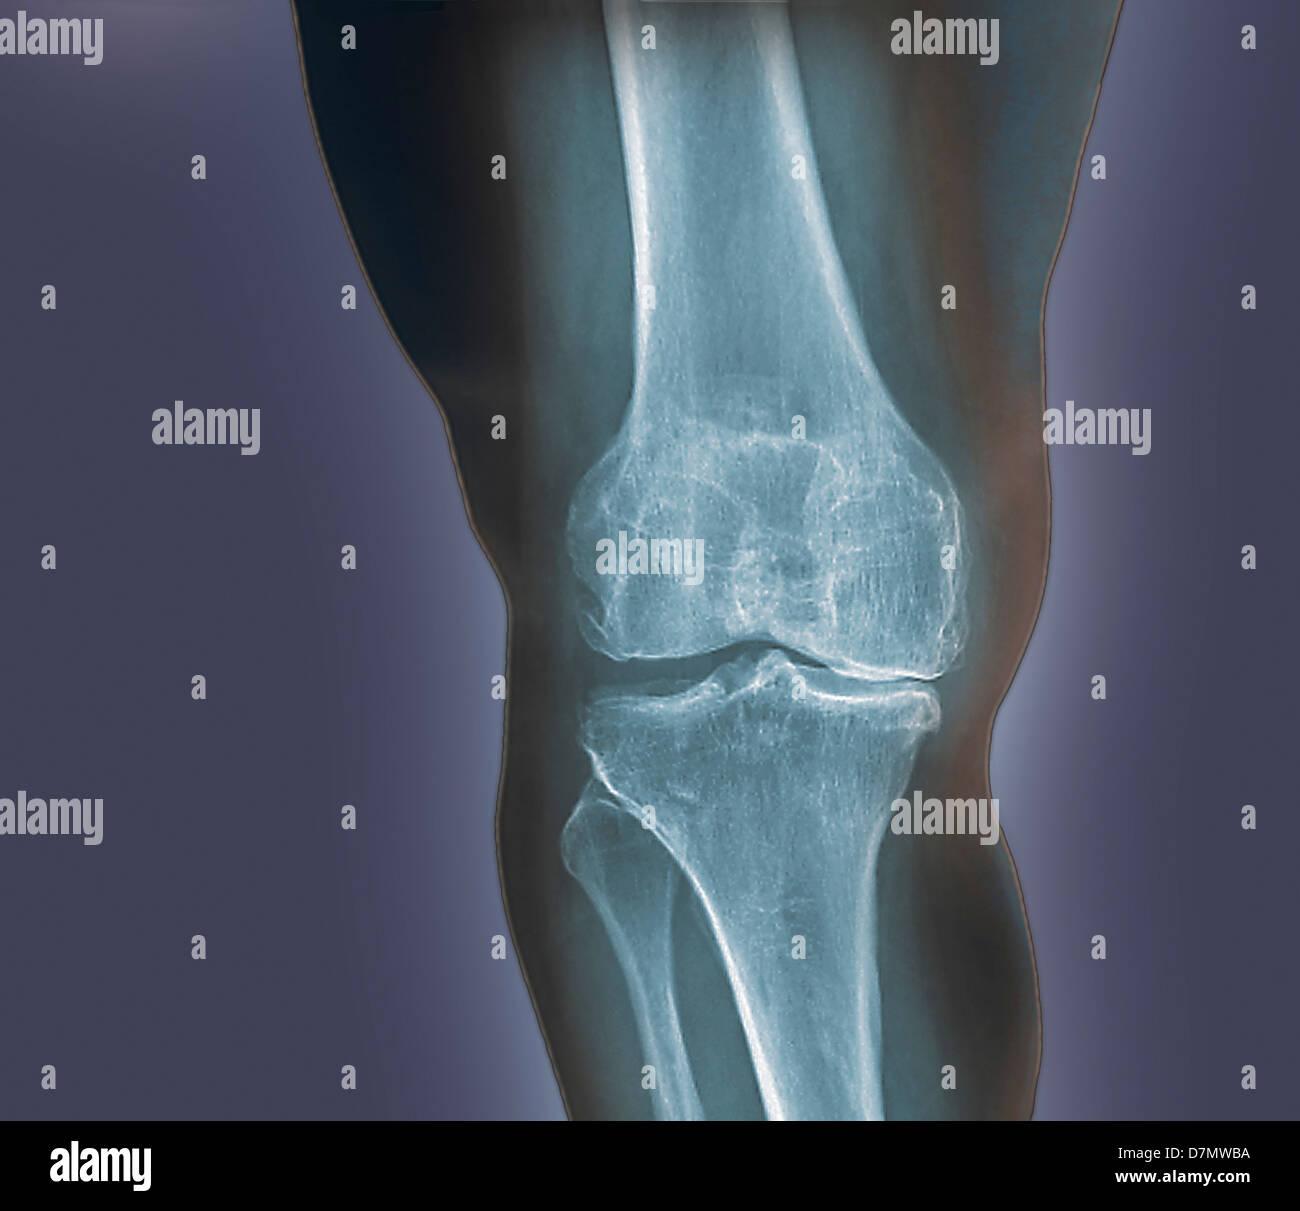 Arthritis of the knee, X-ray - Stock Image